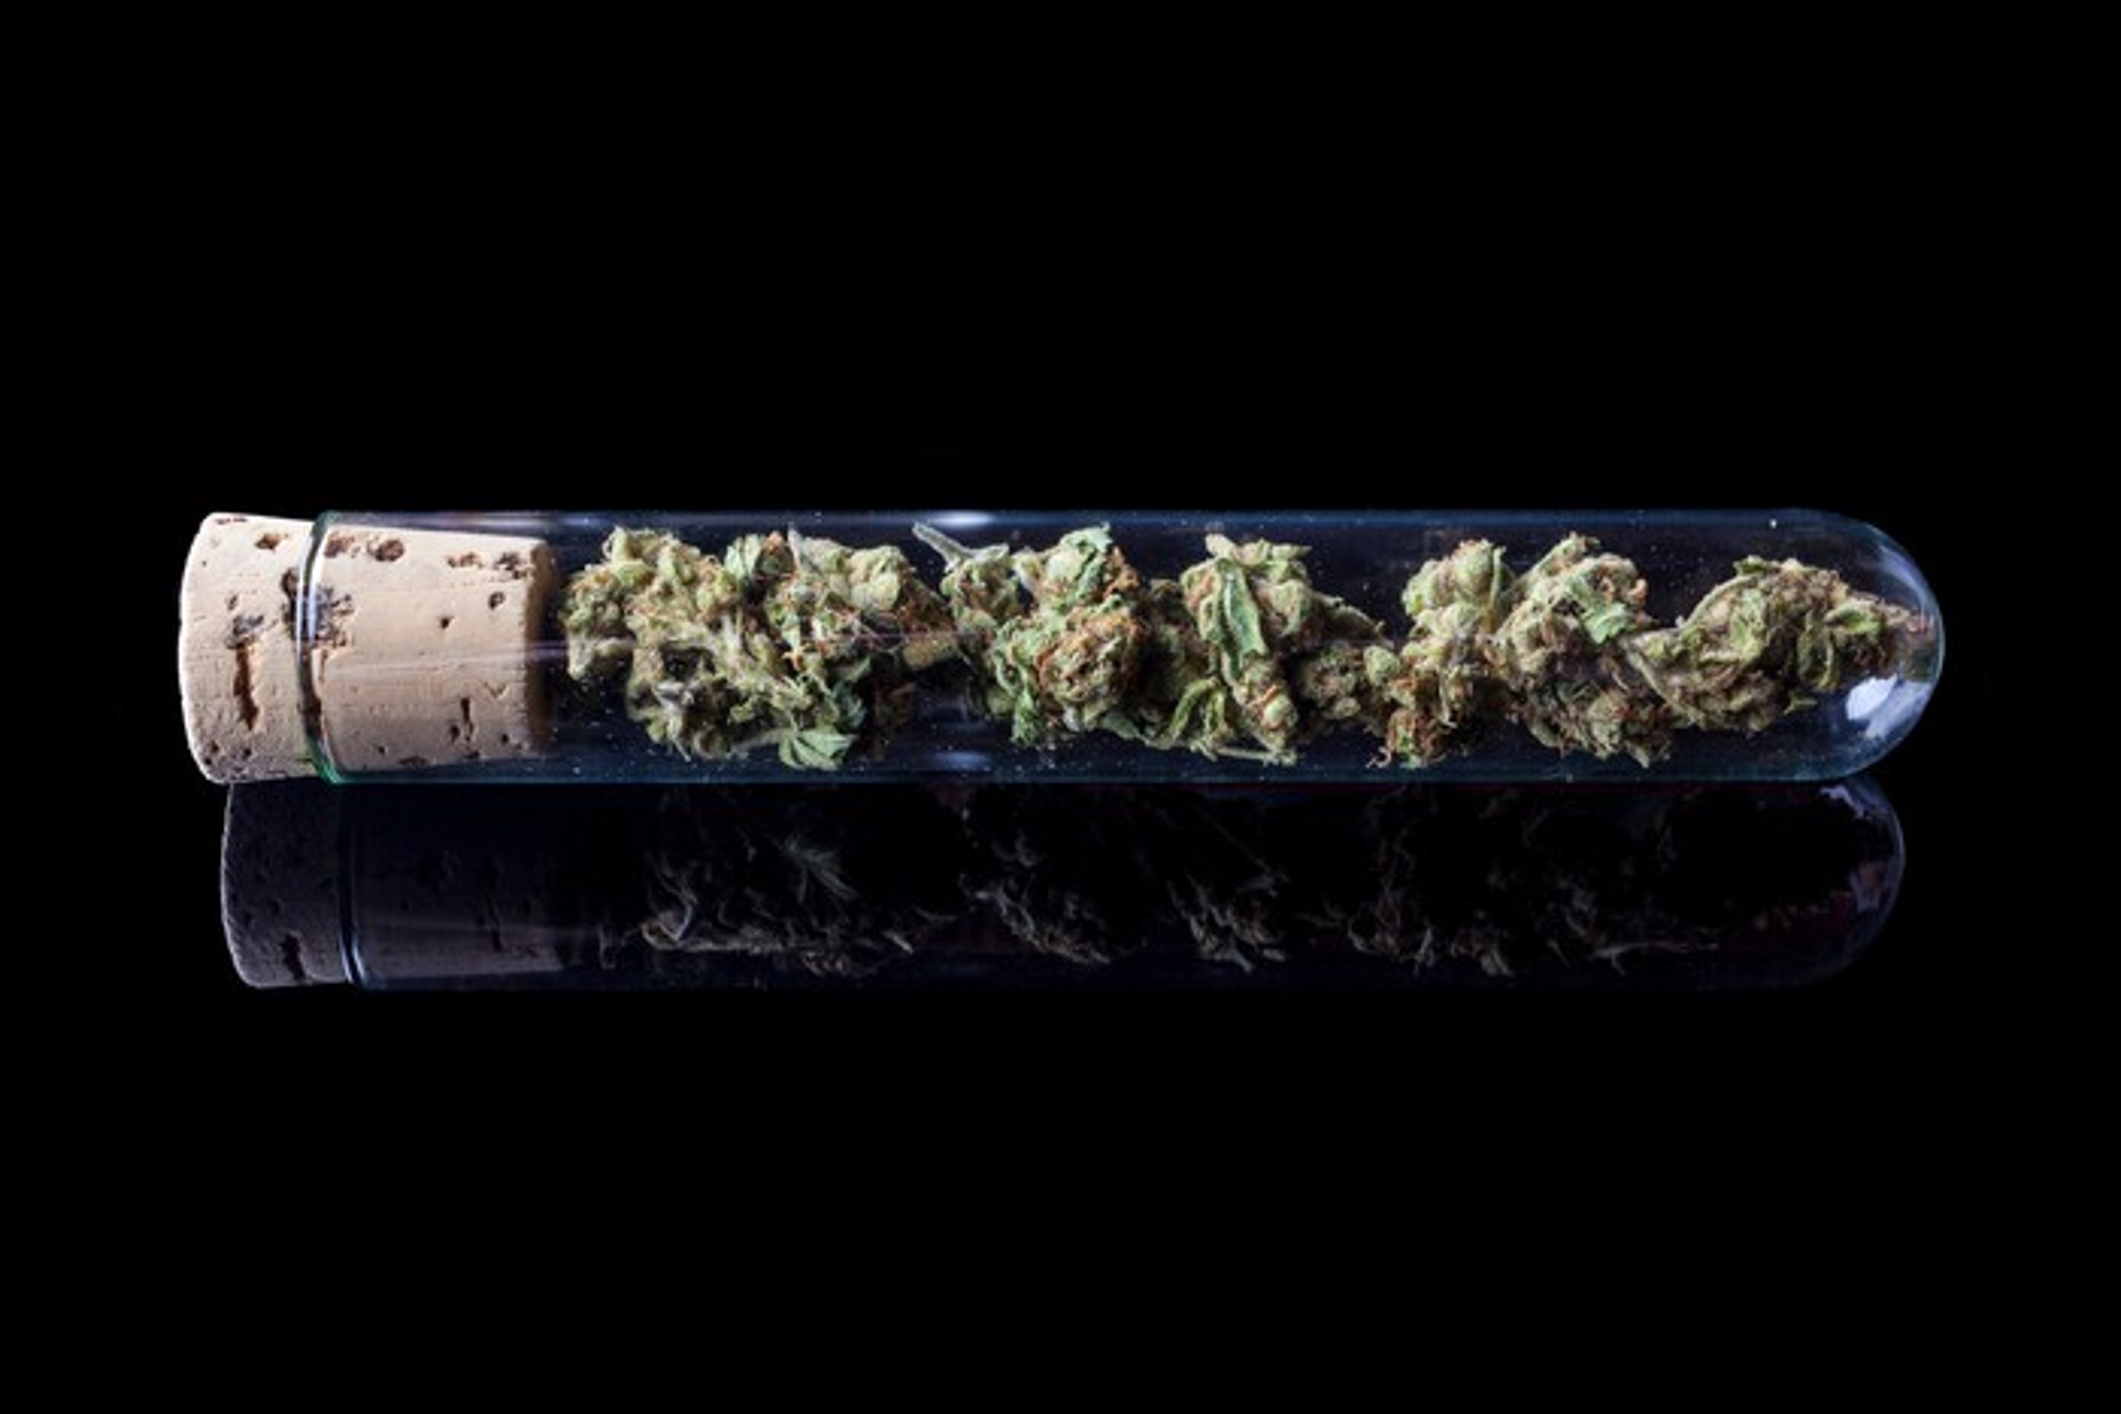 Marijuana buds in test tube against black background